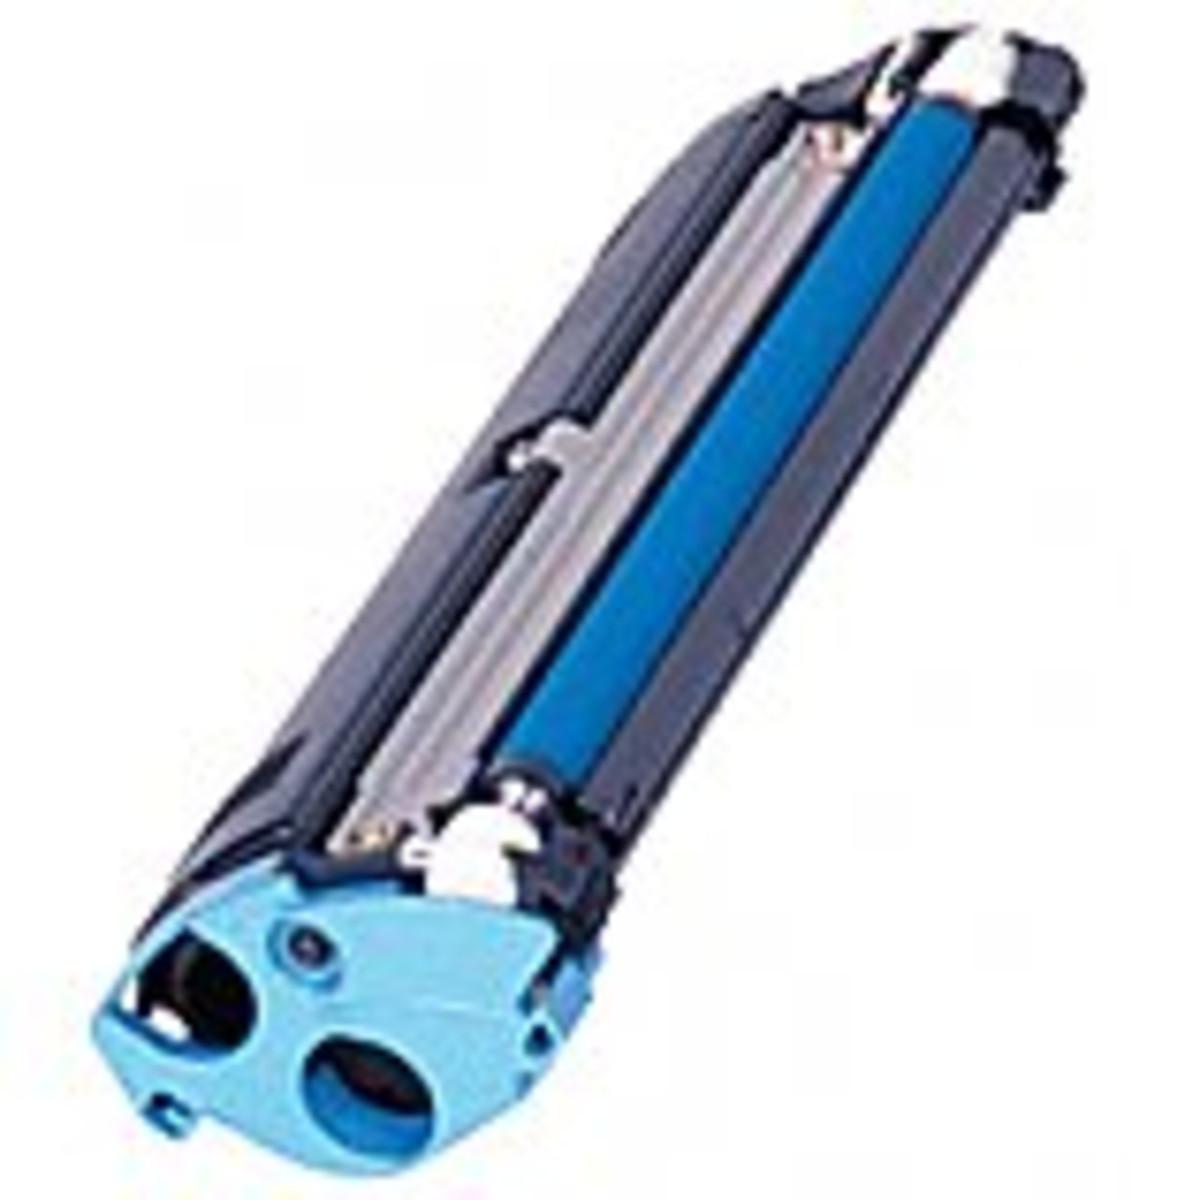 Konica Minolta A0V30HK Cyan Toner Cartridge - High Yield